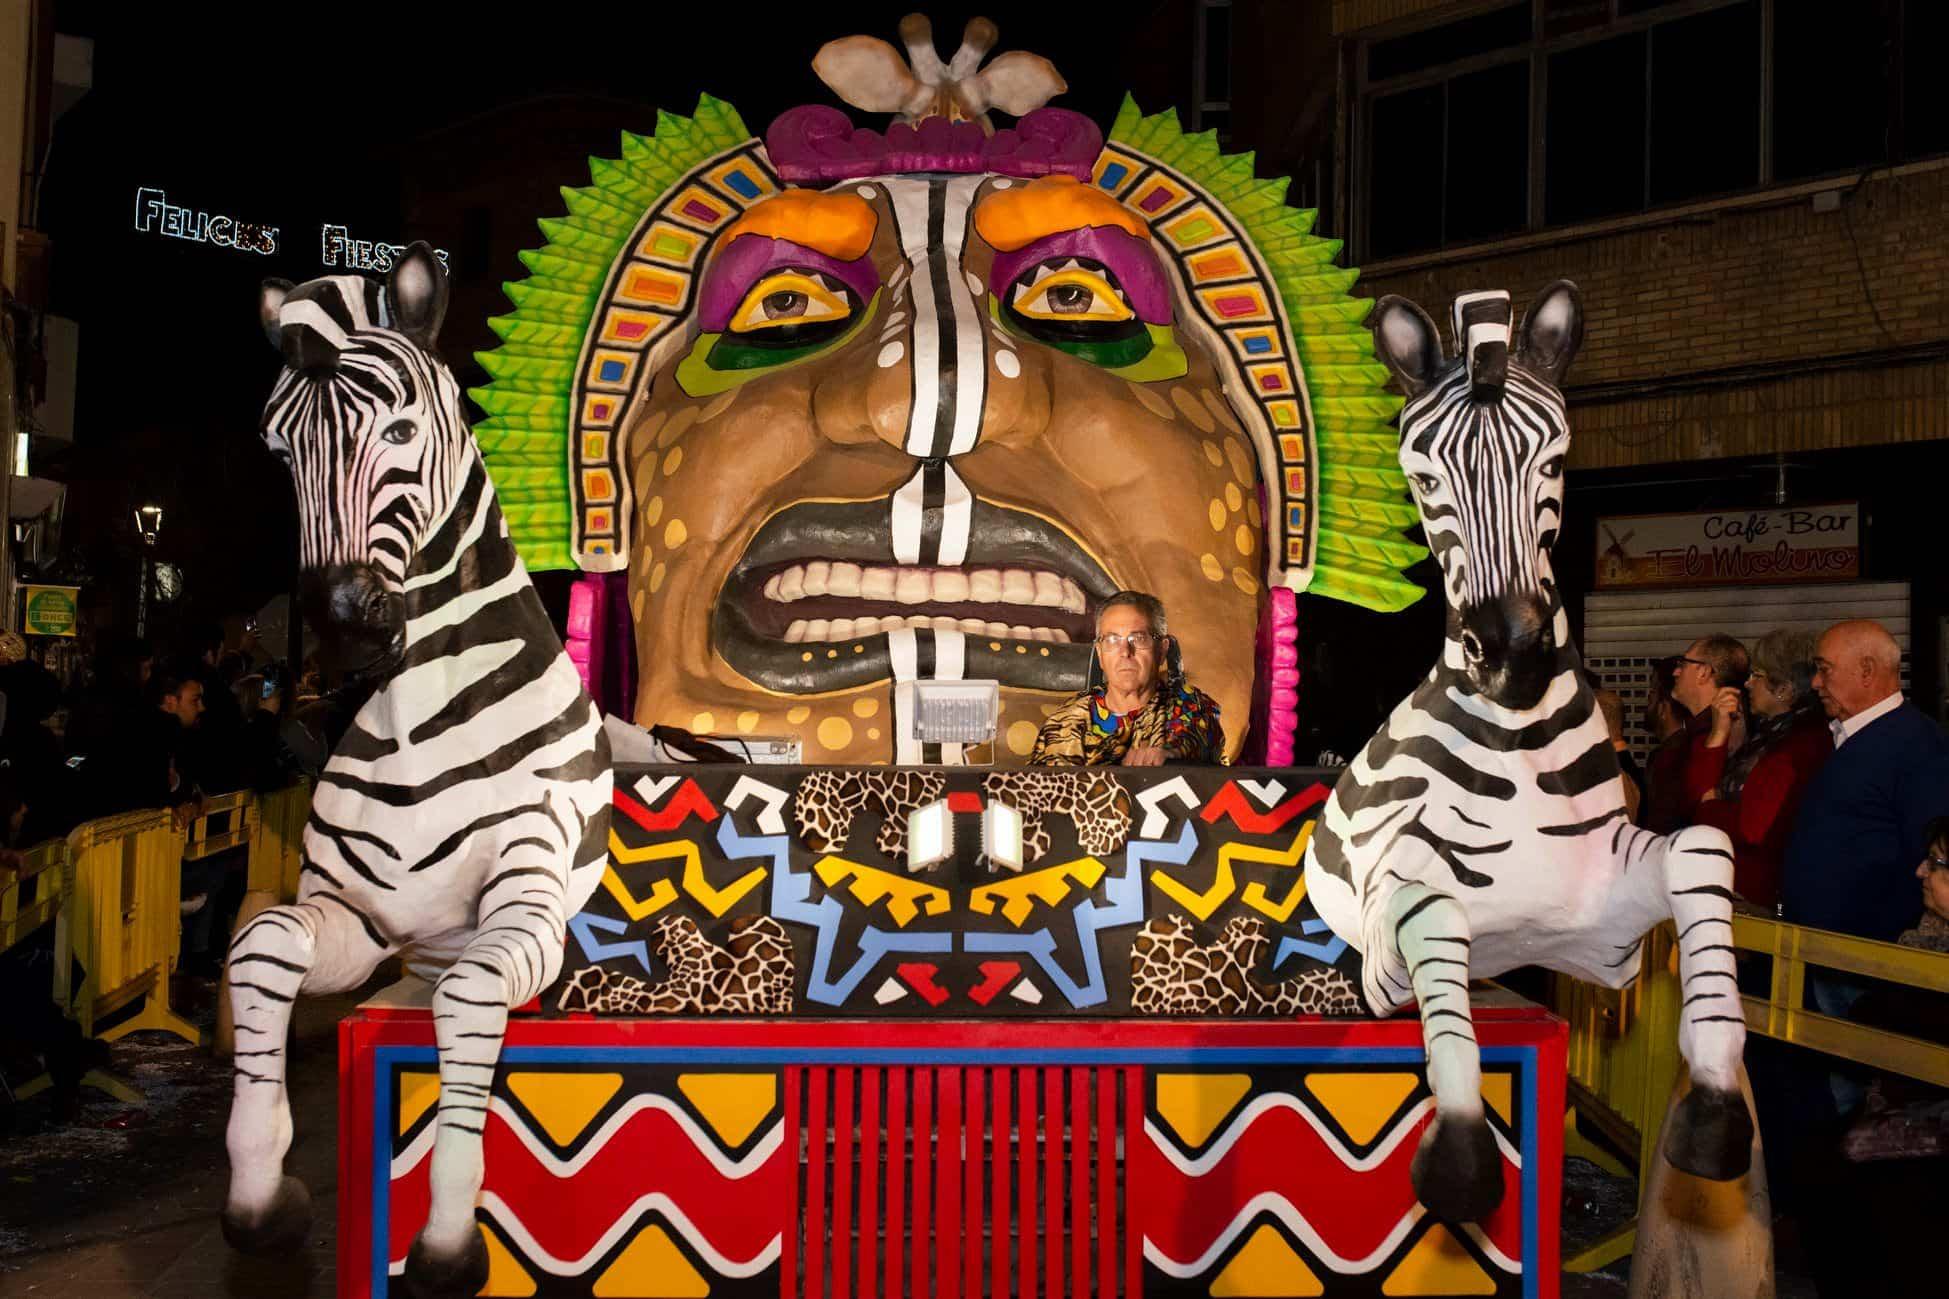 Carnaval de herencia 2020 ofertorio 127 - Selección de fotografías del Ofertorio del Carnaval de Herencia